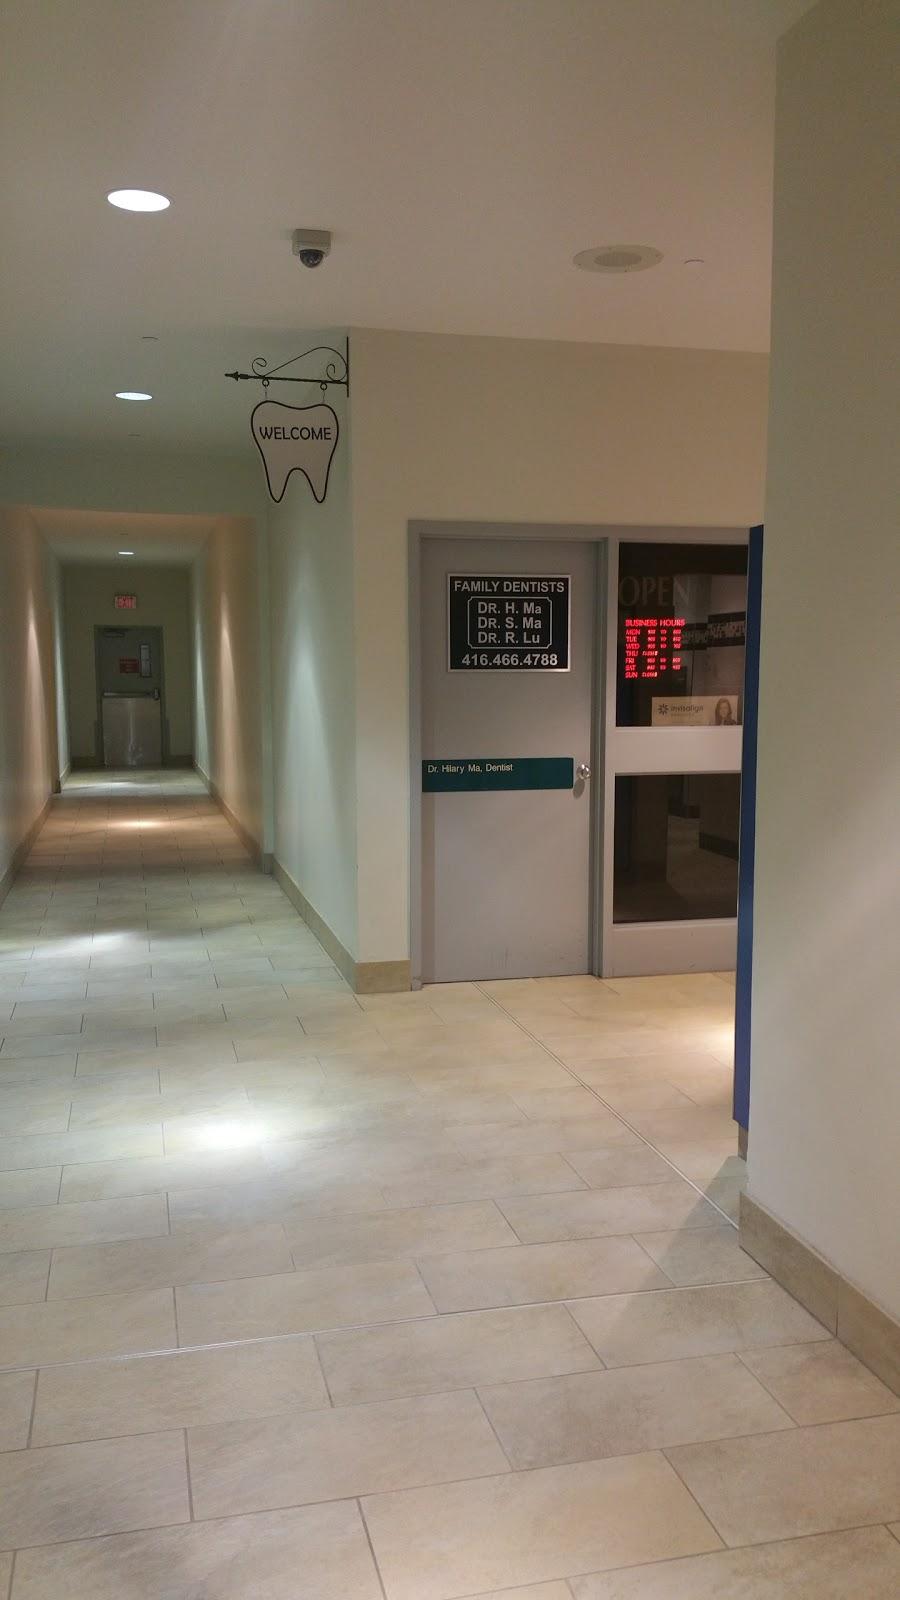 Dr. Hilary Ma & Associates   dentist   1000 Gerrard St. - 2nd Floor, Toronto, ON M4M 3G6, Canada   4164664788 OR +1 416-466-4788